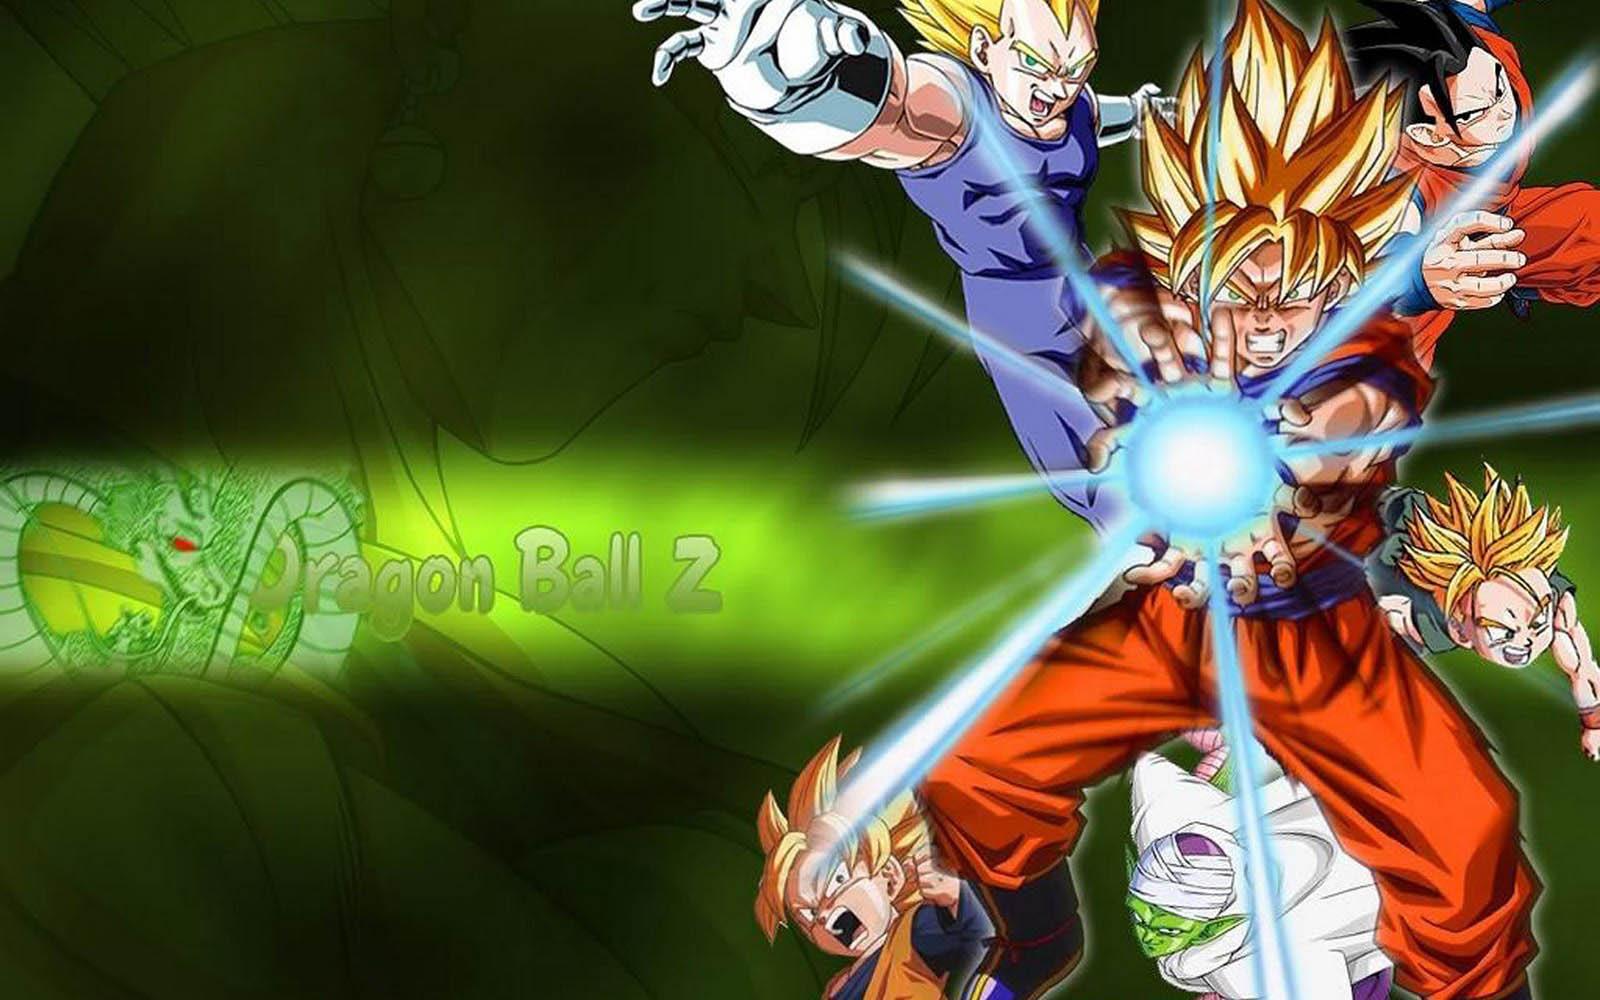 Kumpulan Gambar Animasi Dragon Ball